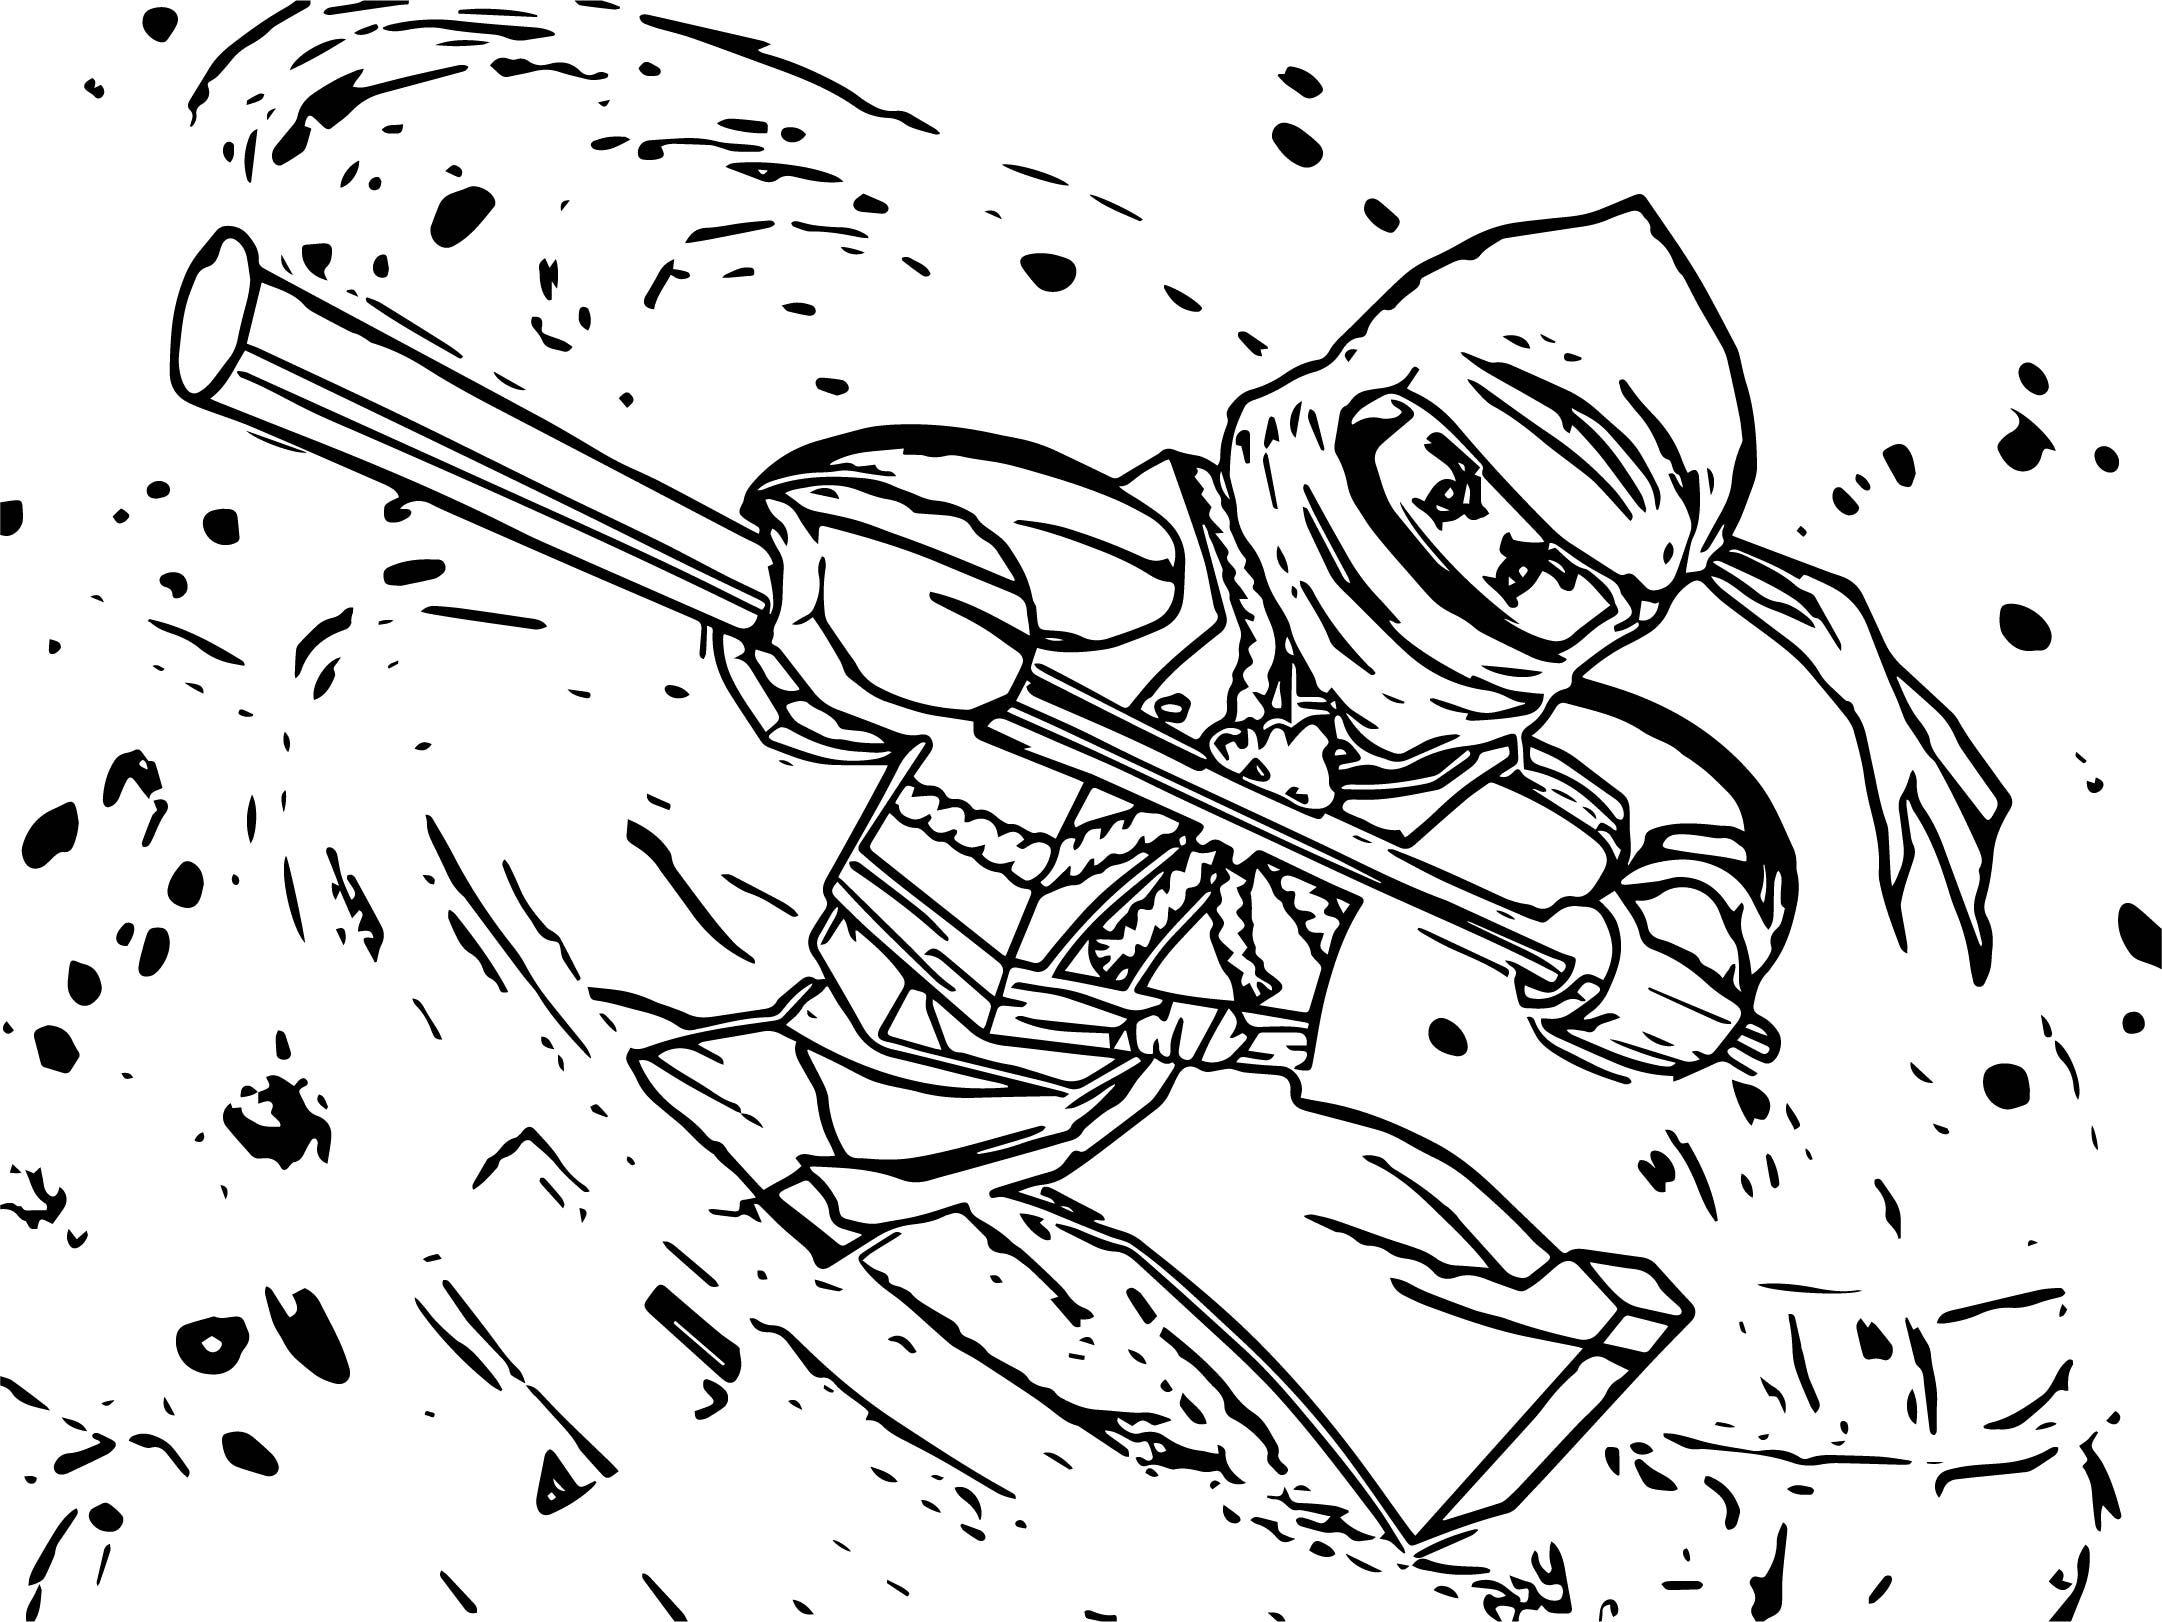 Cool Cartoon Network Ninjago Master Of Spinjitzu Coloring Page Cartoon Coloring Pages Dinosaur Coloring Pages Coloring Pages Winter